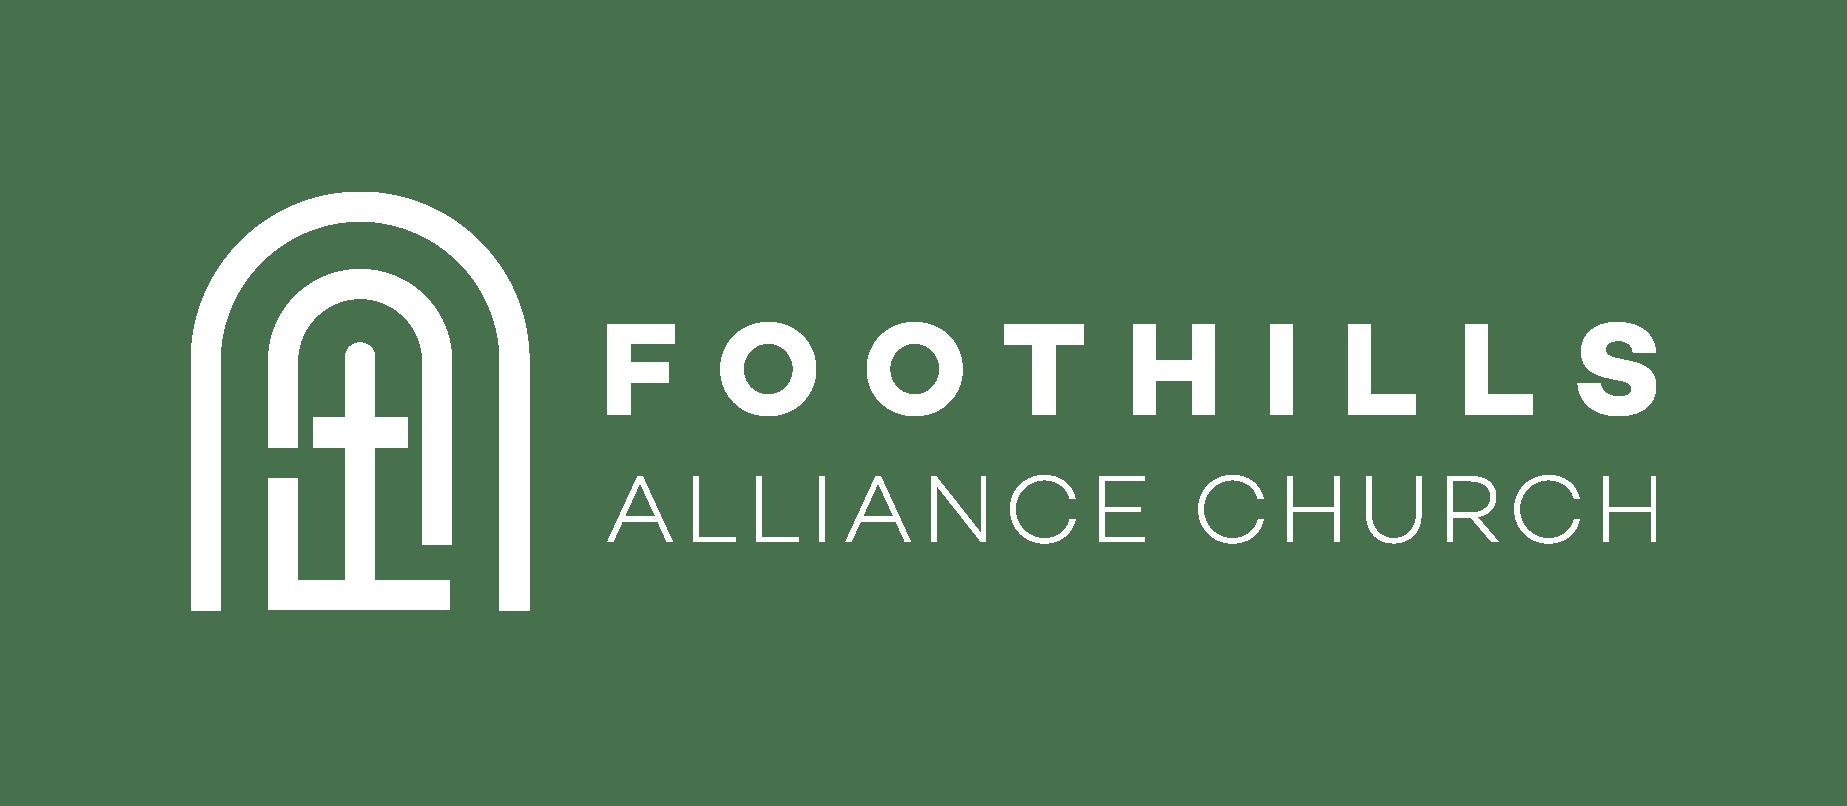 Foothills Alliance Church